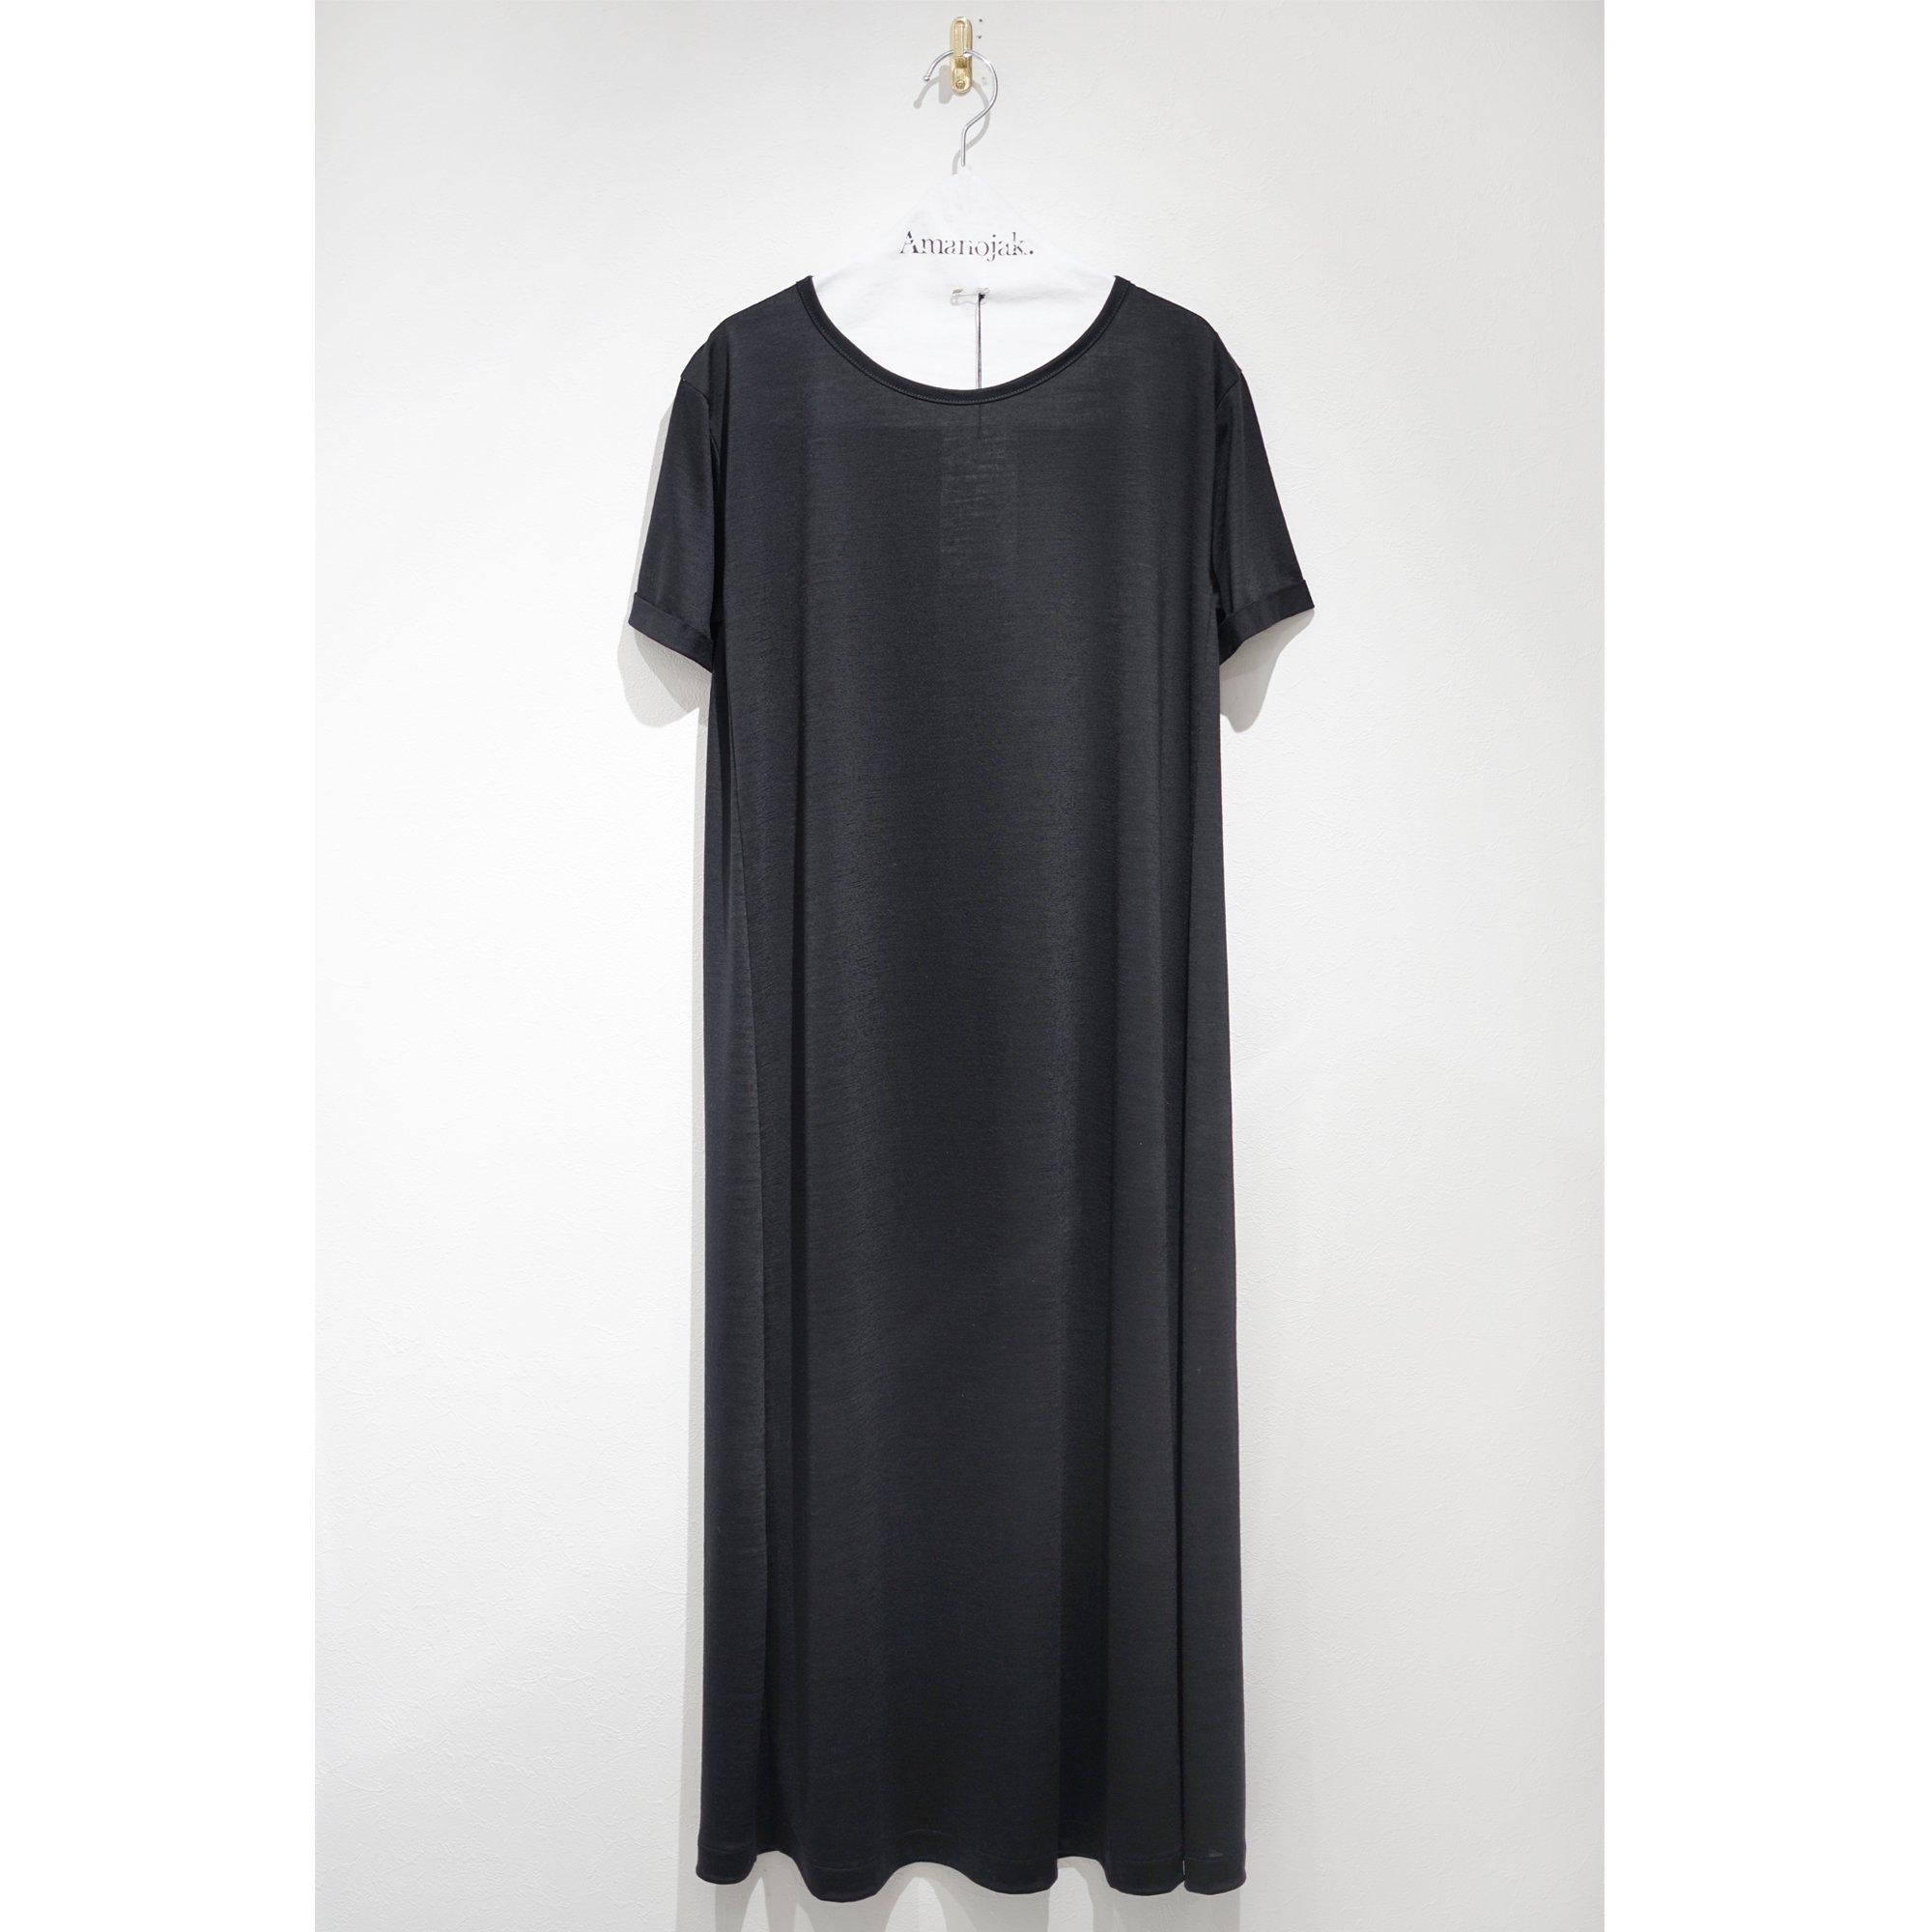 BATONER-WOOL DRESS TEE ONEPIECE BLACK